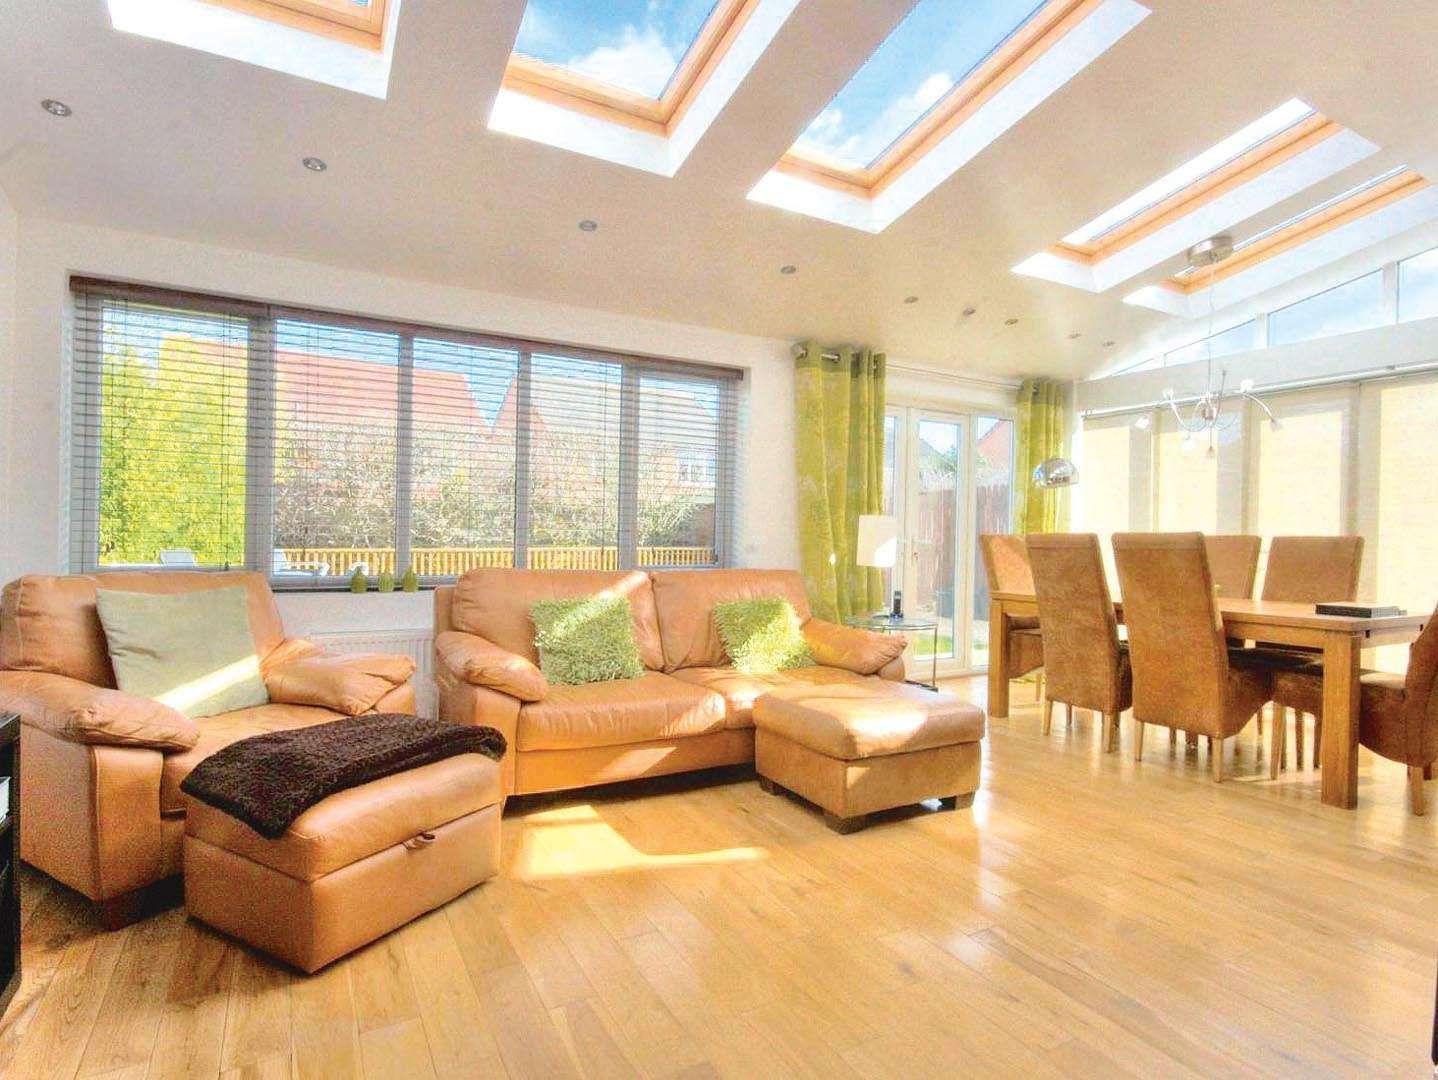 Adding a rear garden room extension real homes home for Garden room extensions